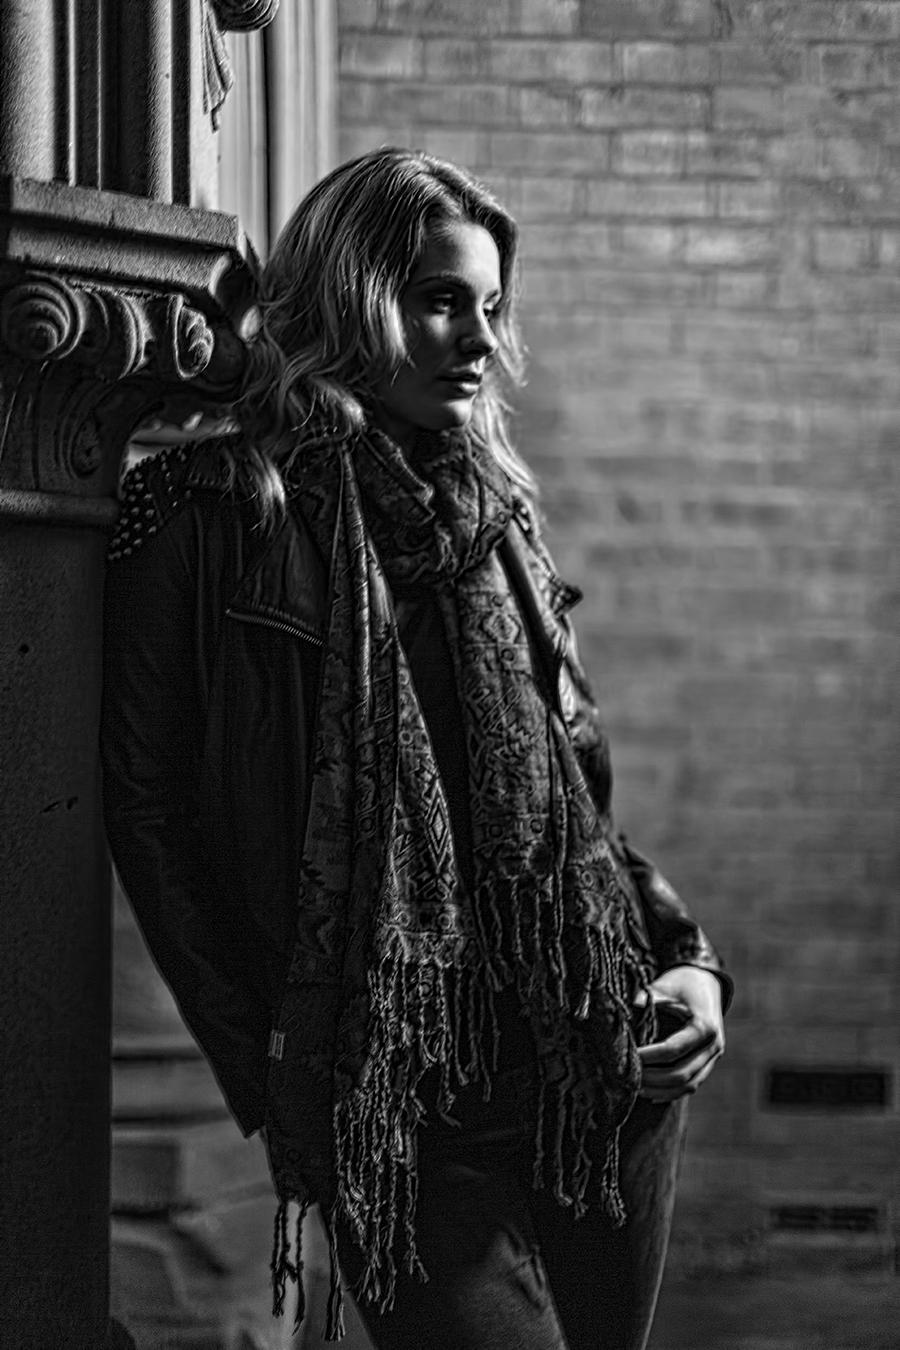 Photography by GaryMac Photography, Model Artemis Fauna / Uploaded 5th November 2015 @ 01:09 AM